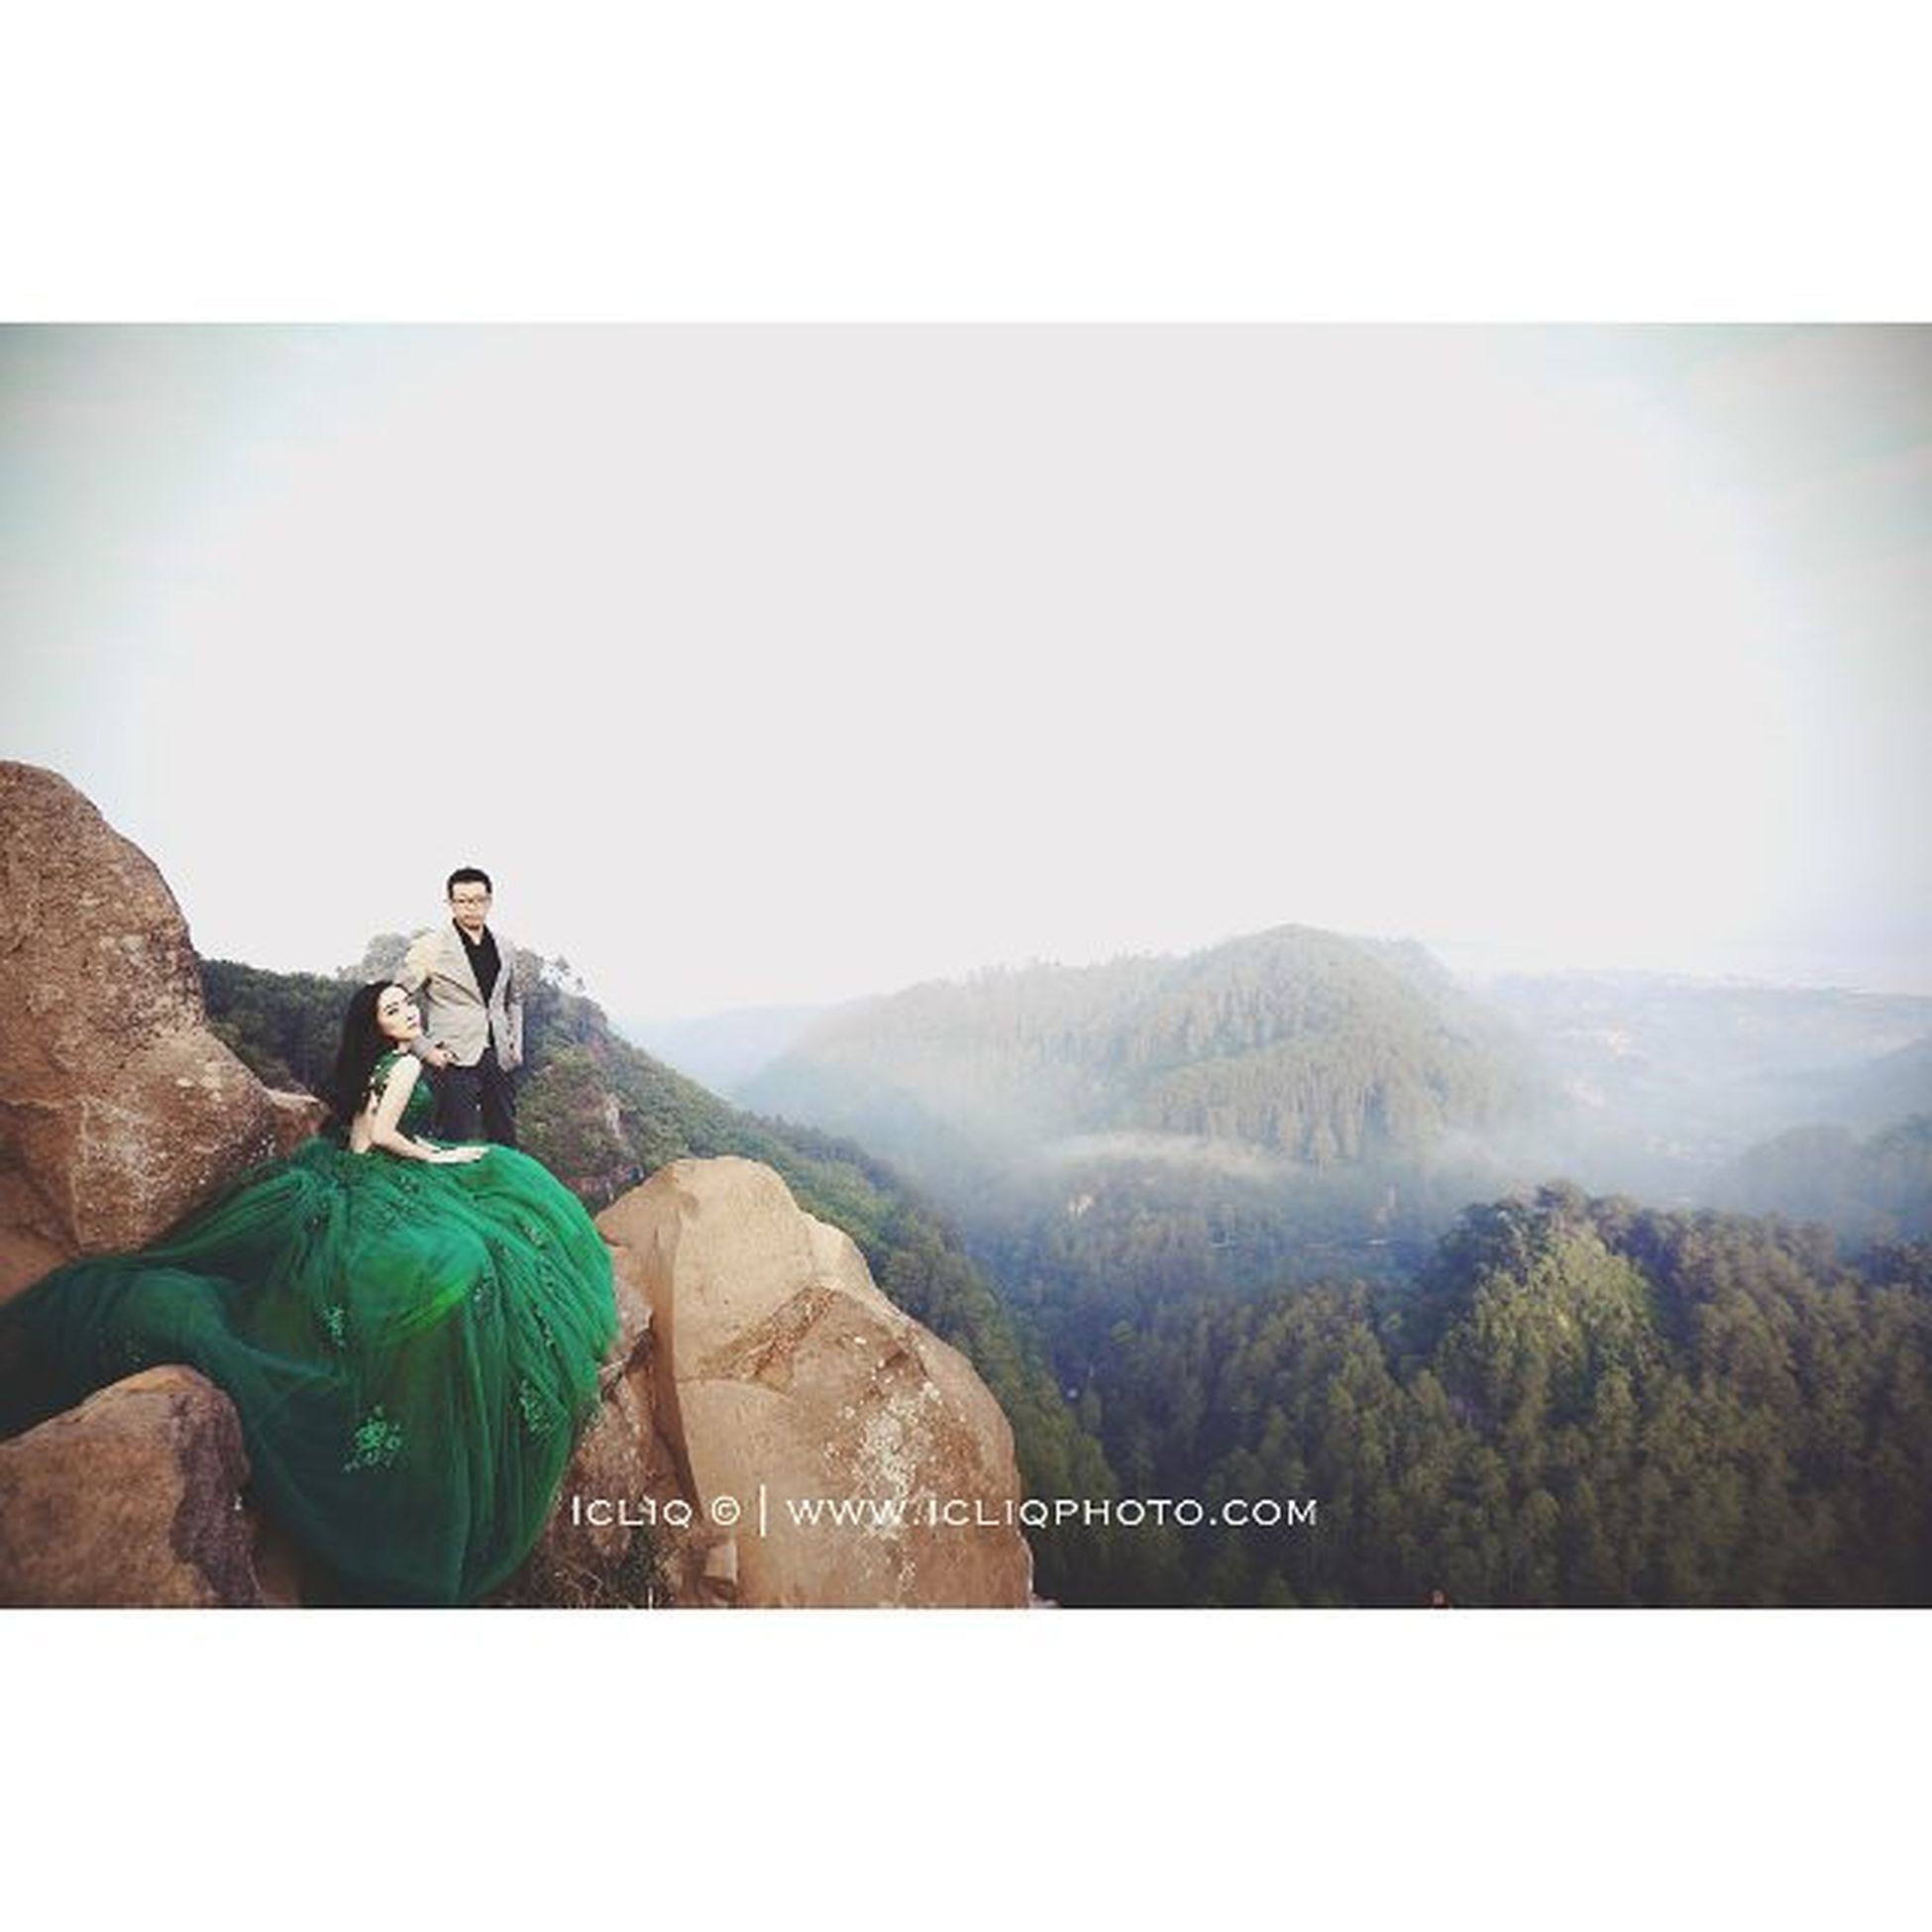 There is no end in possibilities. Prewedding Icliq Icliqphoto Wedding Alfreddewi Photo @welky Mua @vichristiana Style @jamesartha Gown @weddboutique